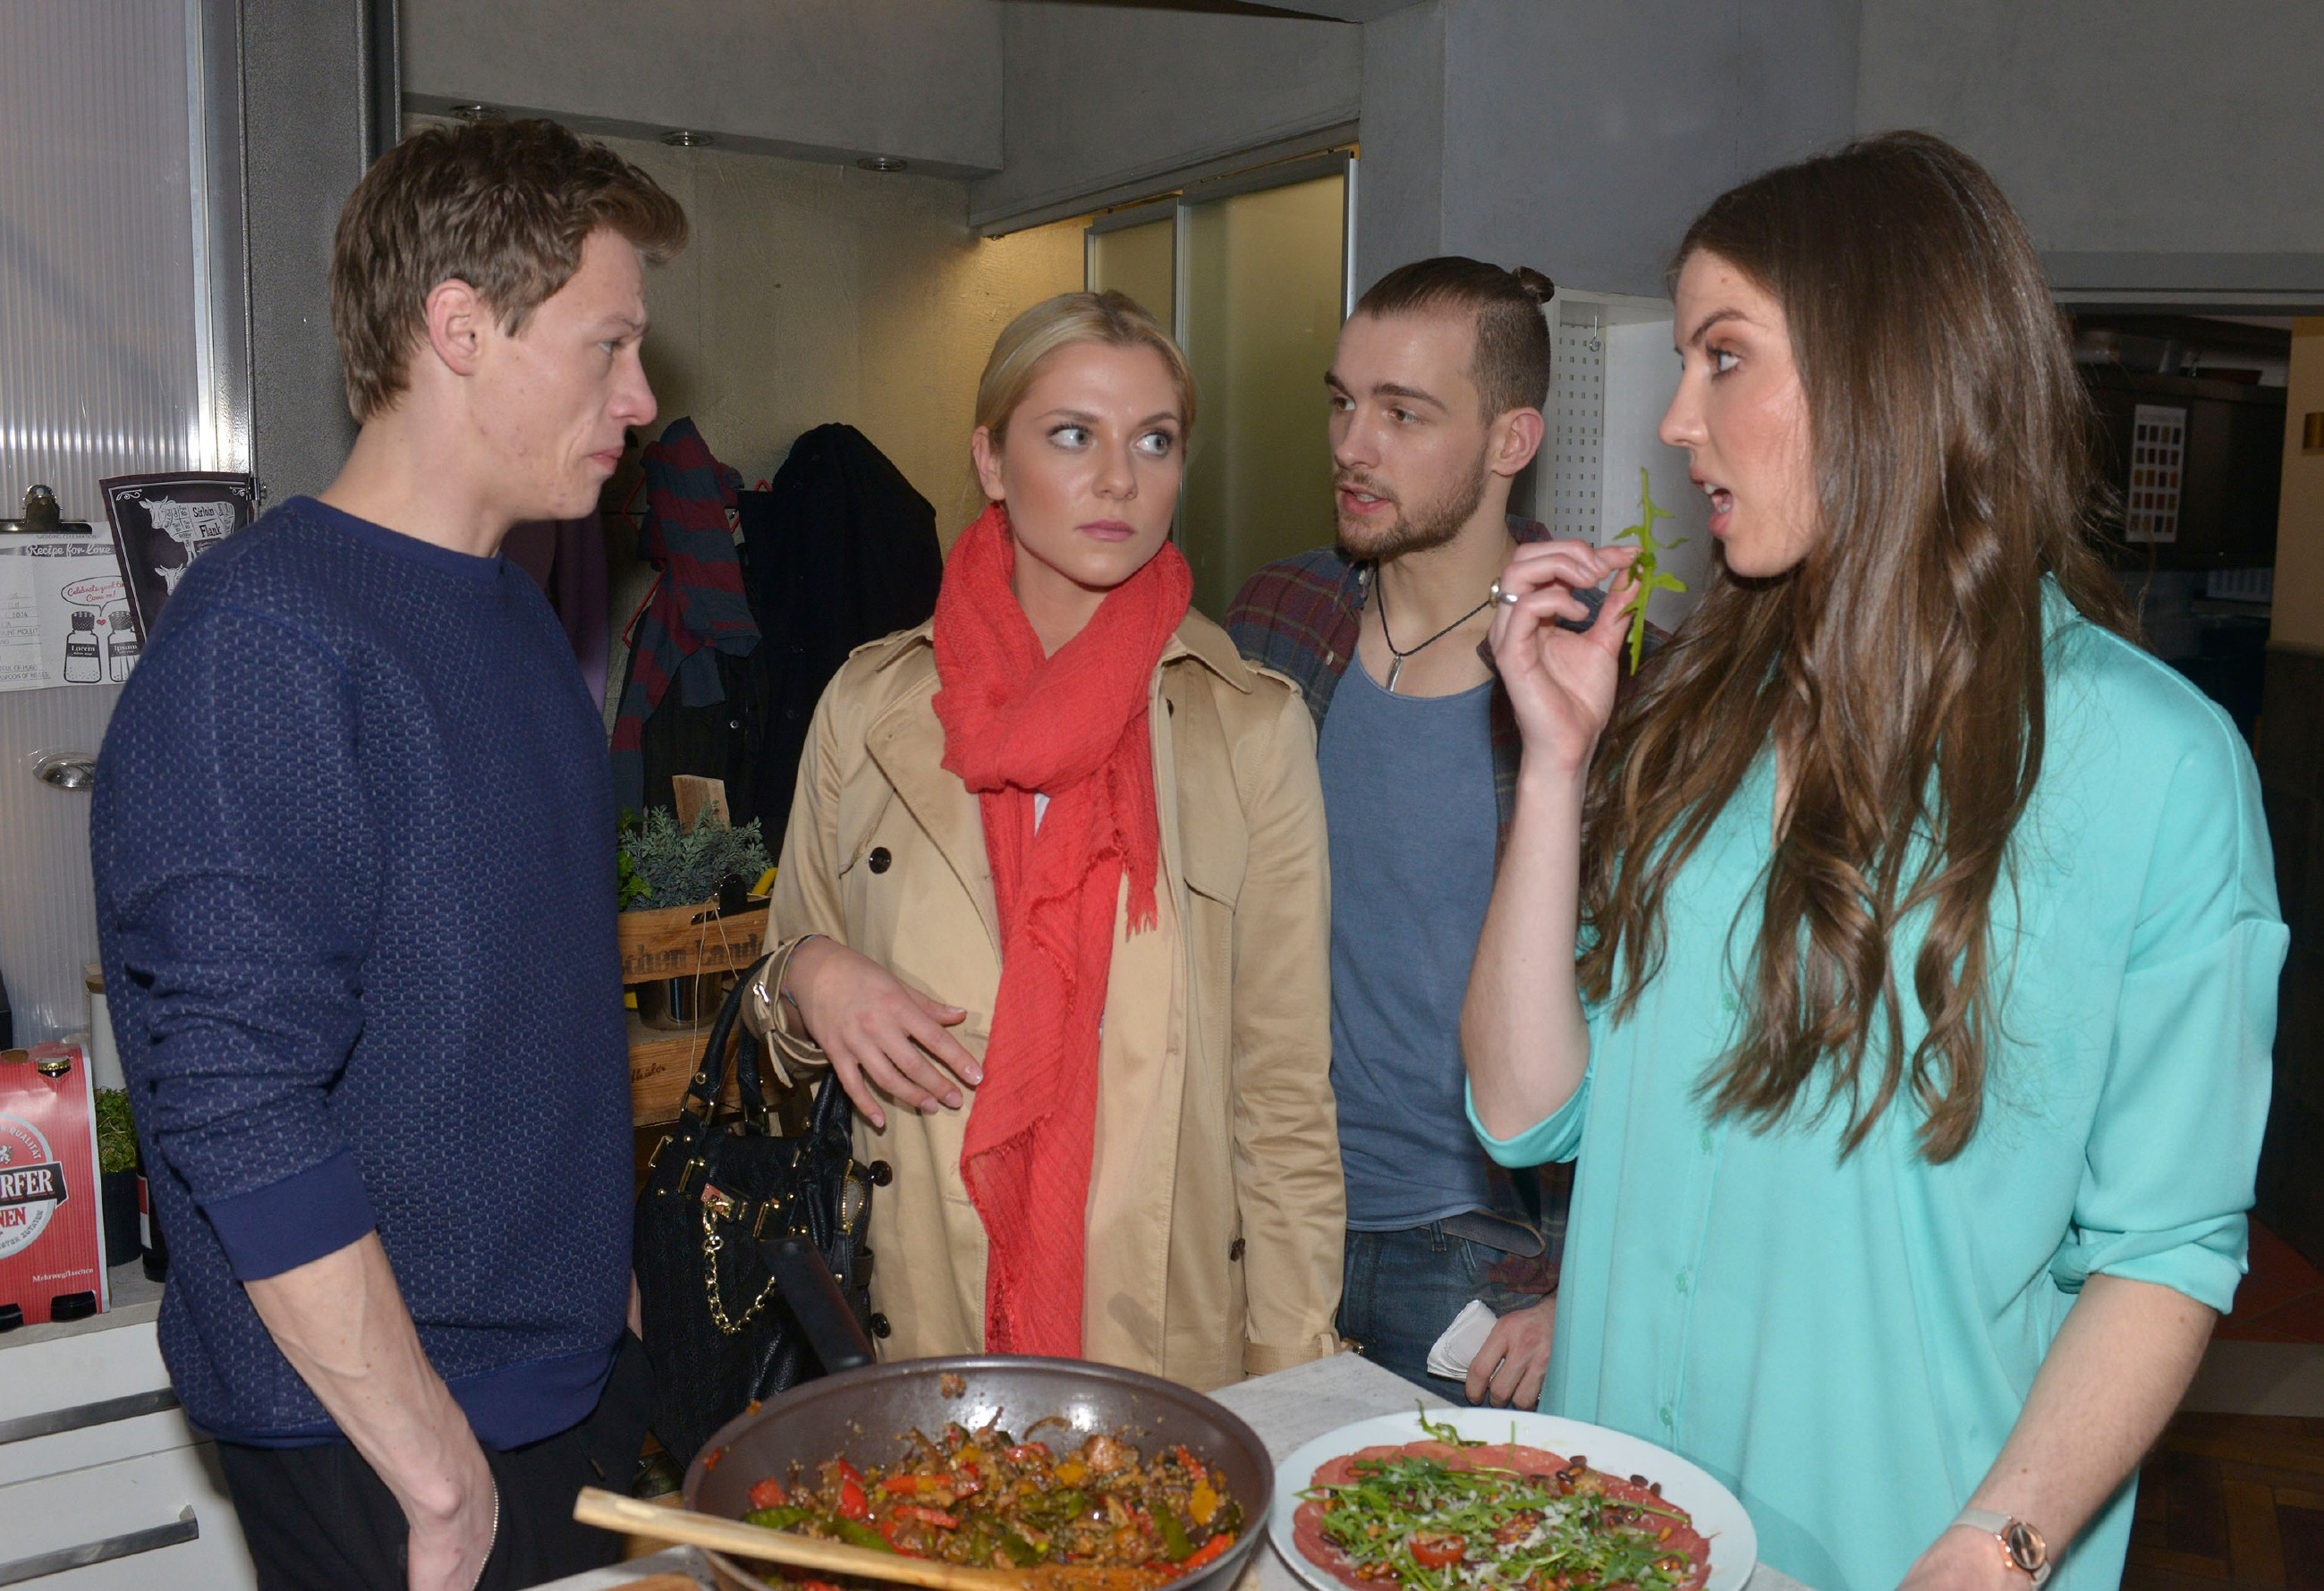 Als Sunny (Valentina Pahde, 2.v.l.) annehmen muss, dass Vince (Vincent Krüger, l.) mit Alica (Stefanie Antonia Wermeling) geflirtet hat, springt Chris (Eric Stehfest) Vince bei.